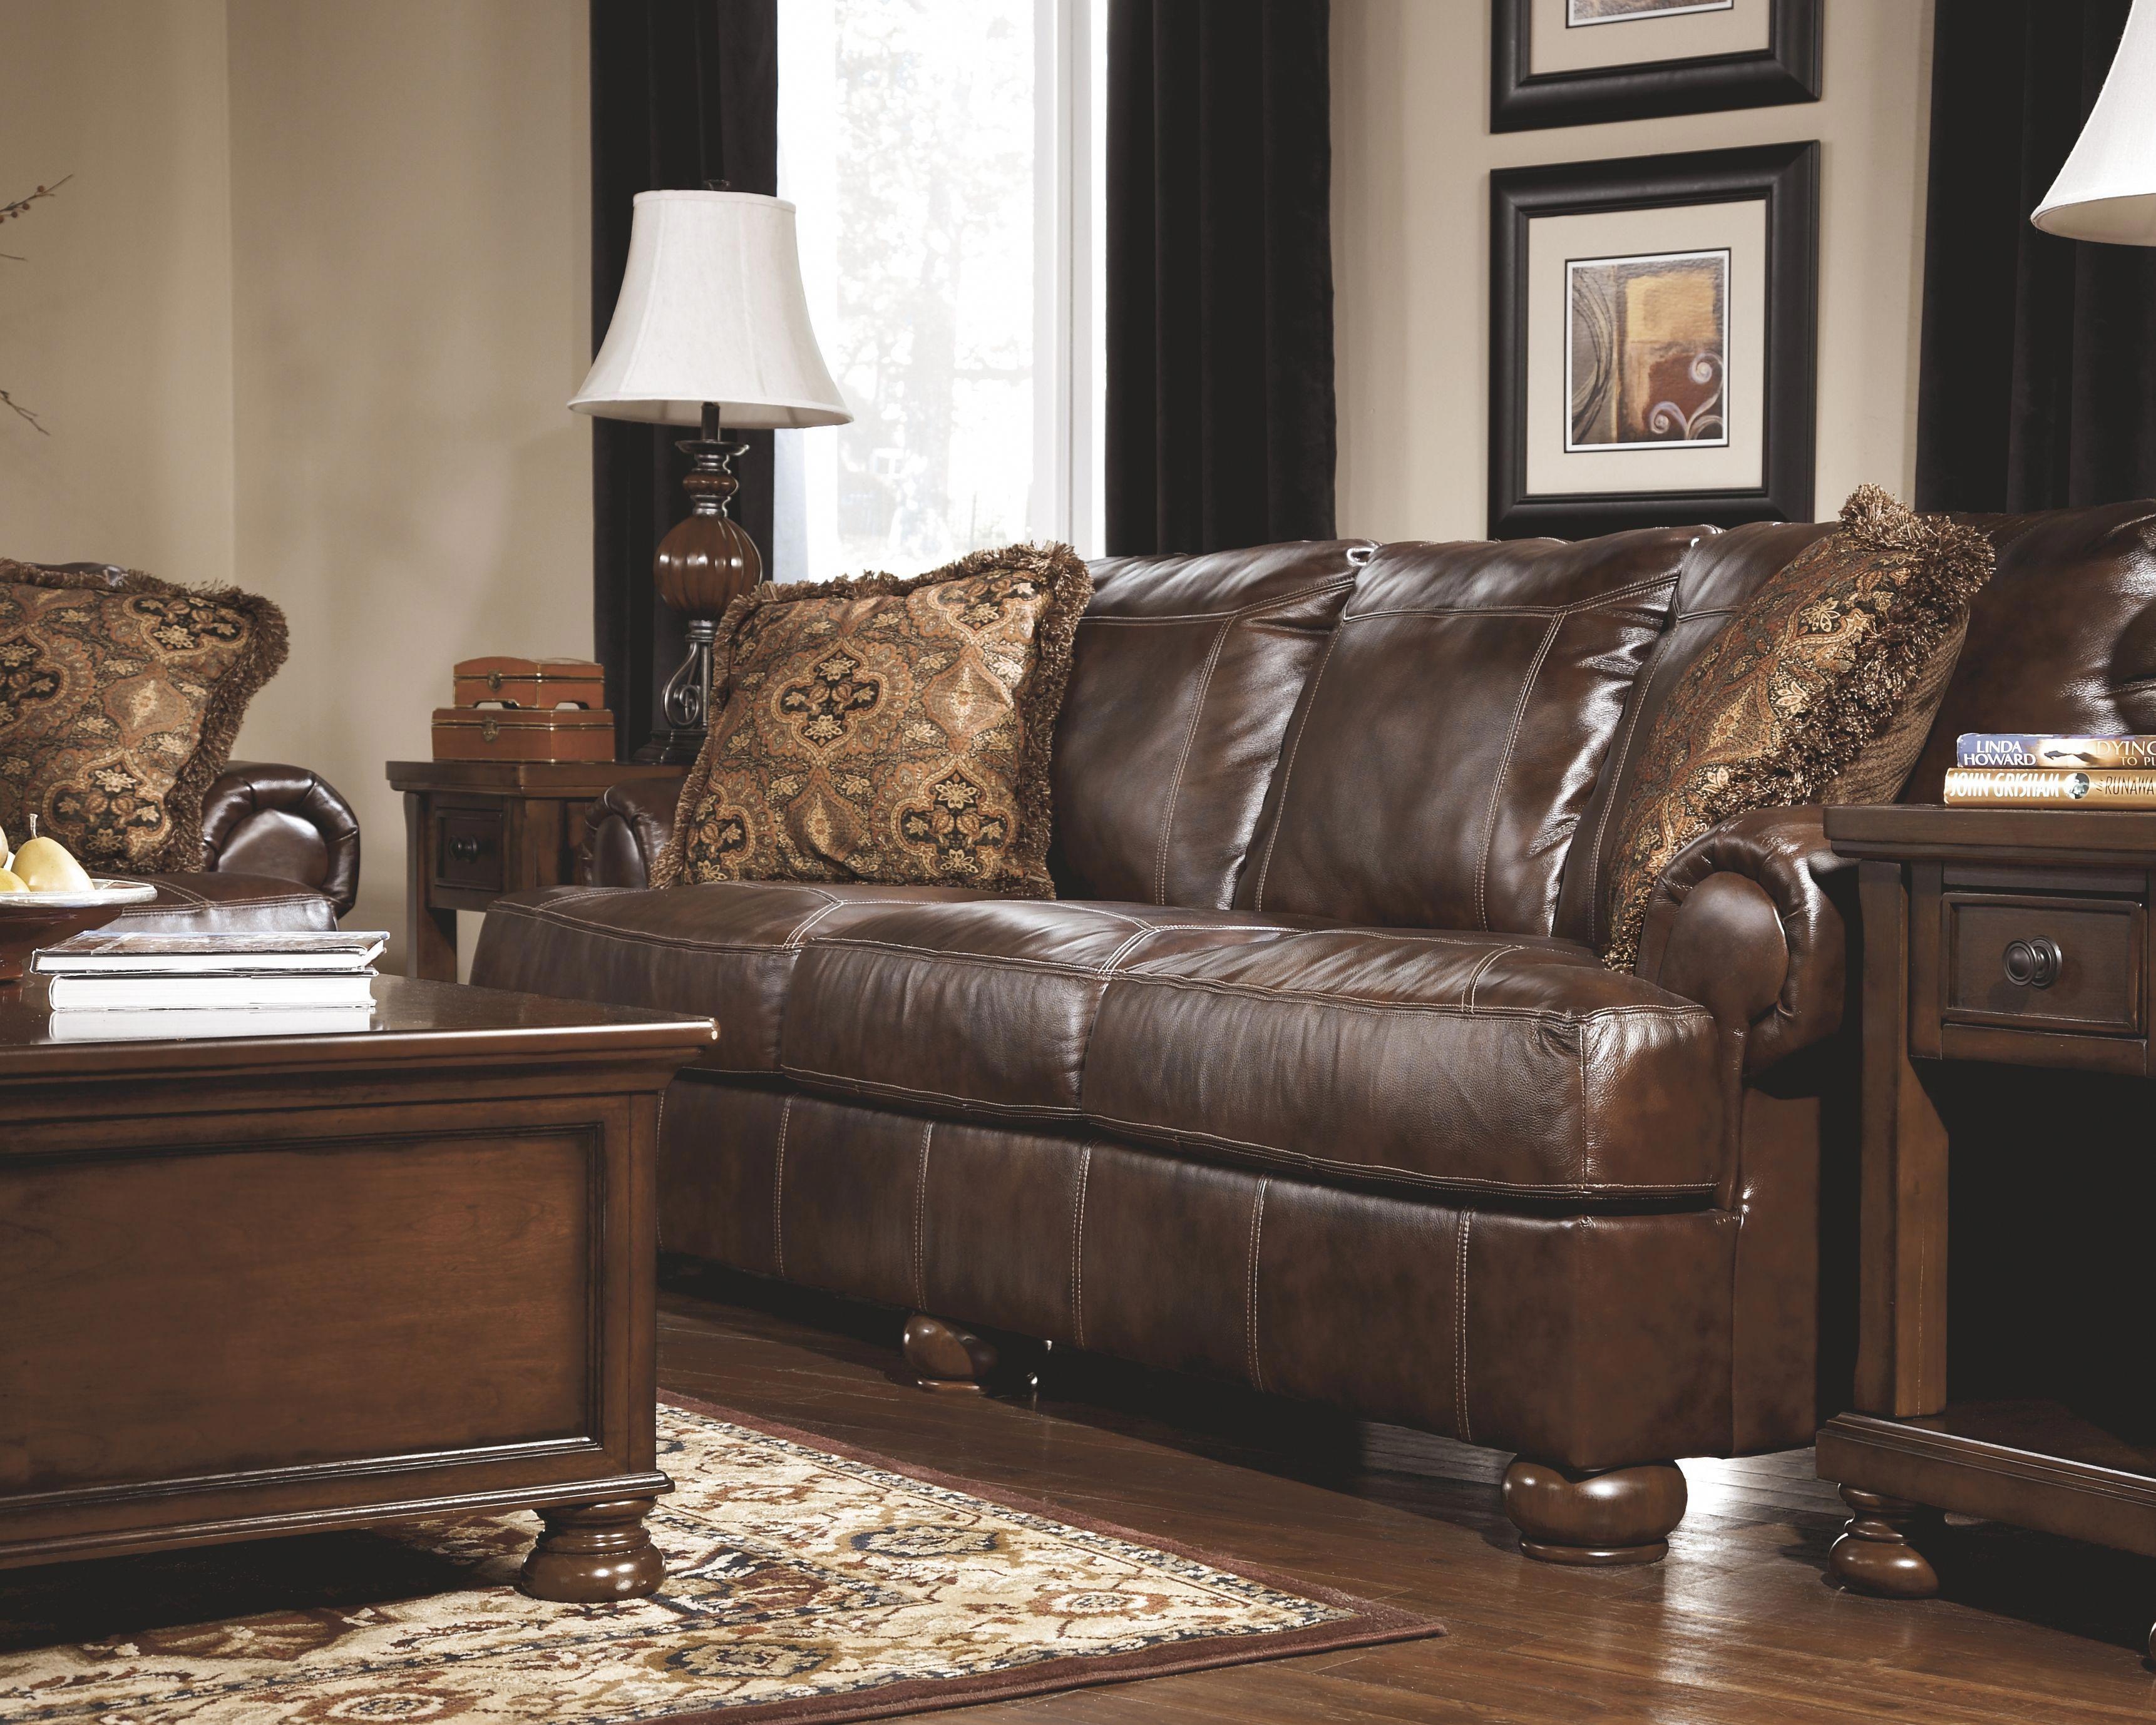 Axiom Sofa Walnut Leather In 2020 Ashley Furniture Furniture